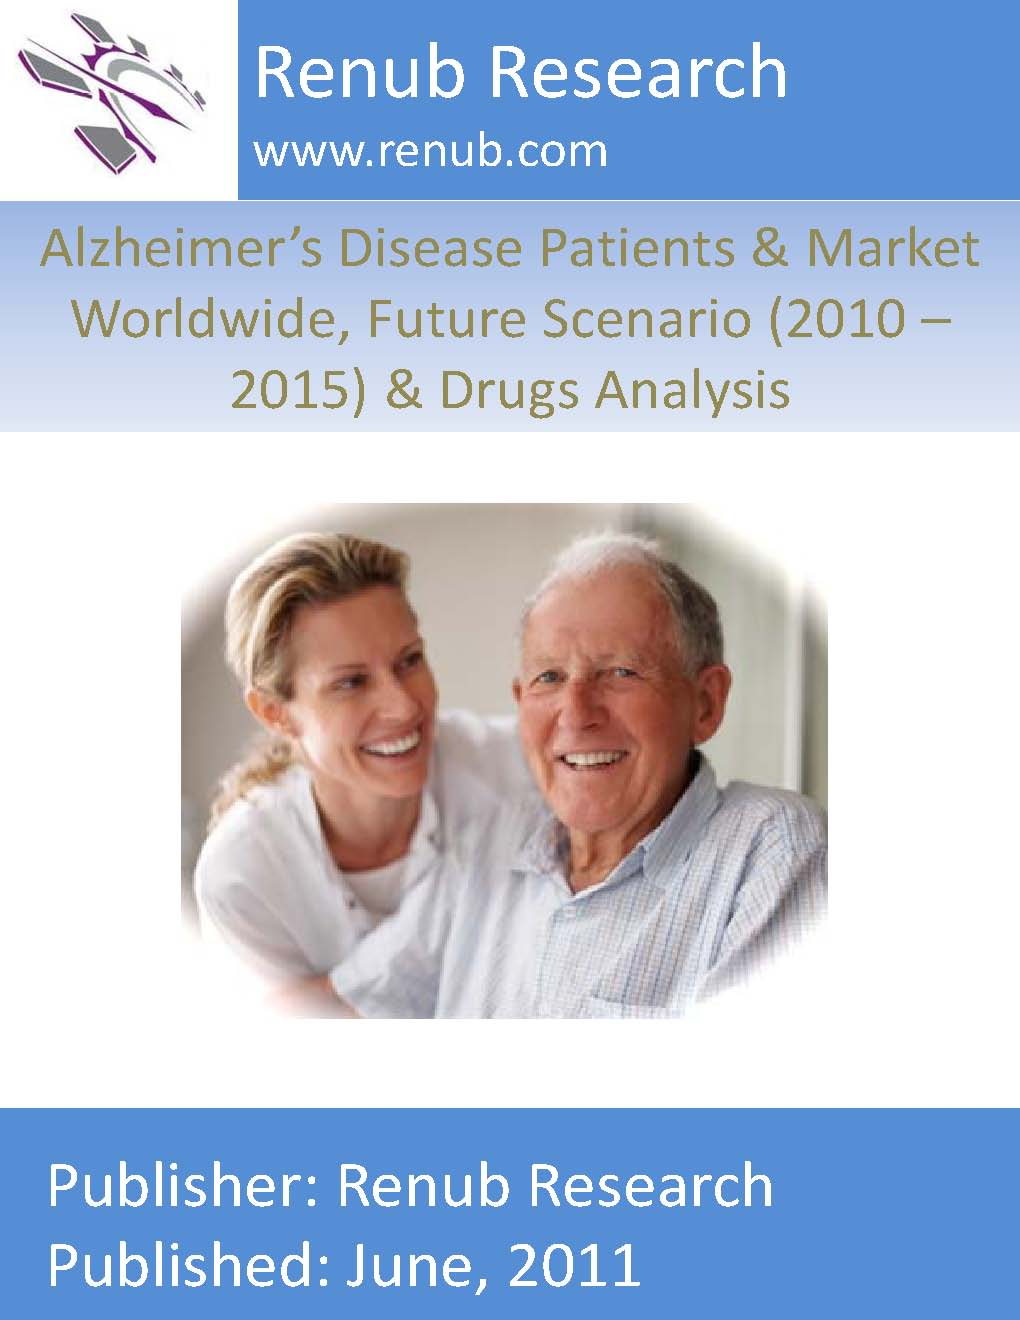 Alzheimer's Disease Patients & Market Worldwide, Future Scenario (2010 - 2015) & Drugs Analysis